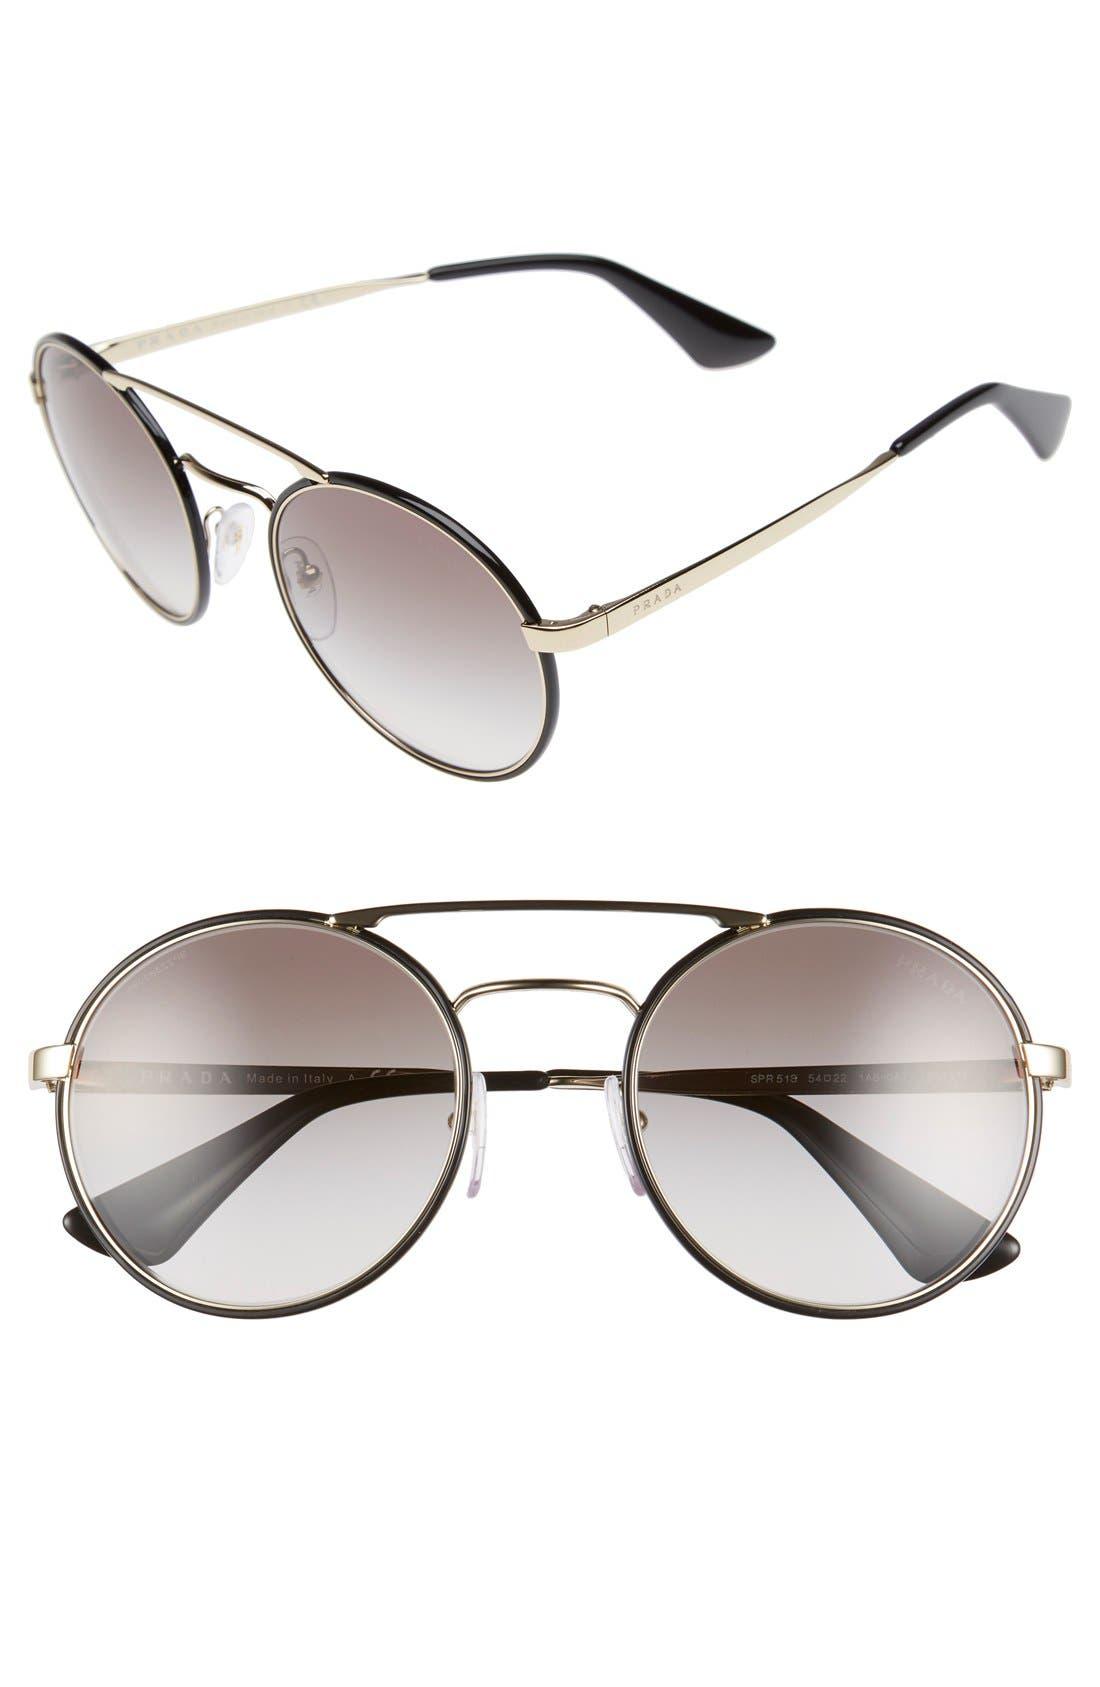 Alternate Image 1 Selected - Prada 'Cinemà' 54mm Round Sunglasses